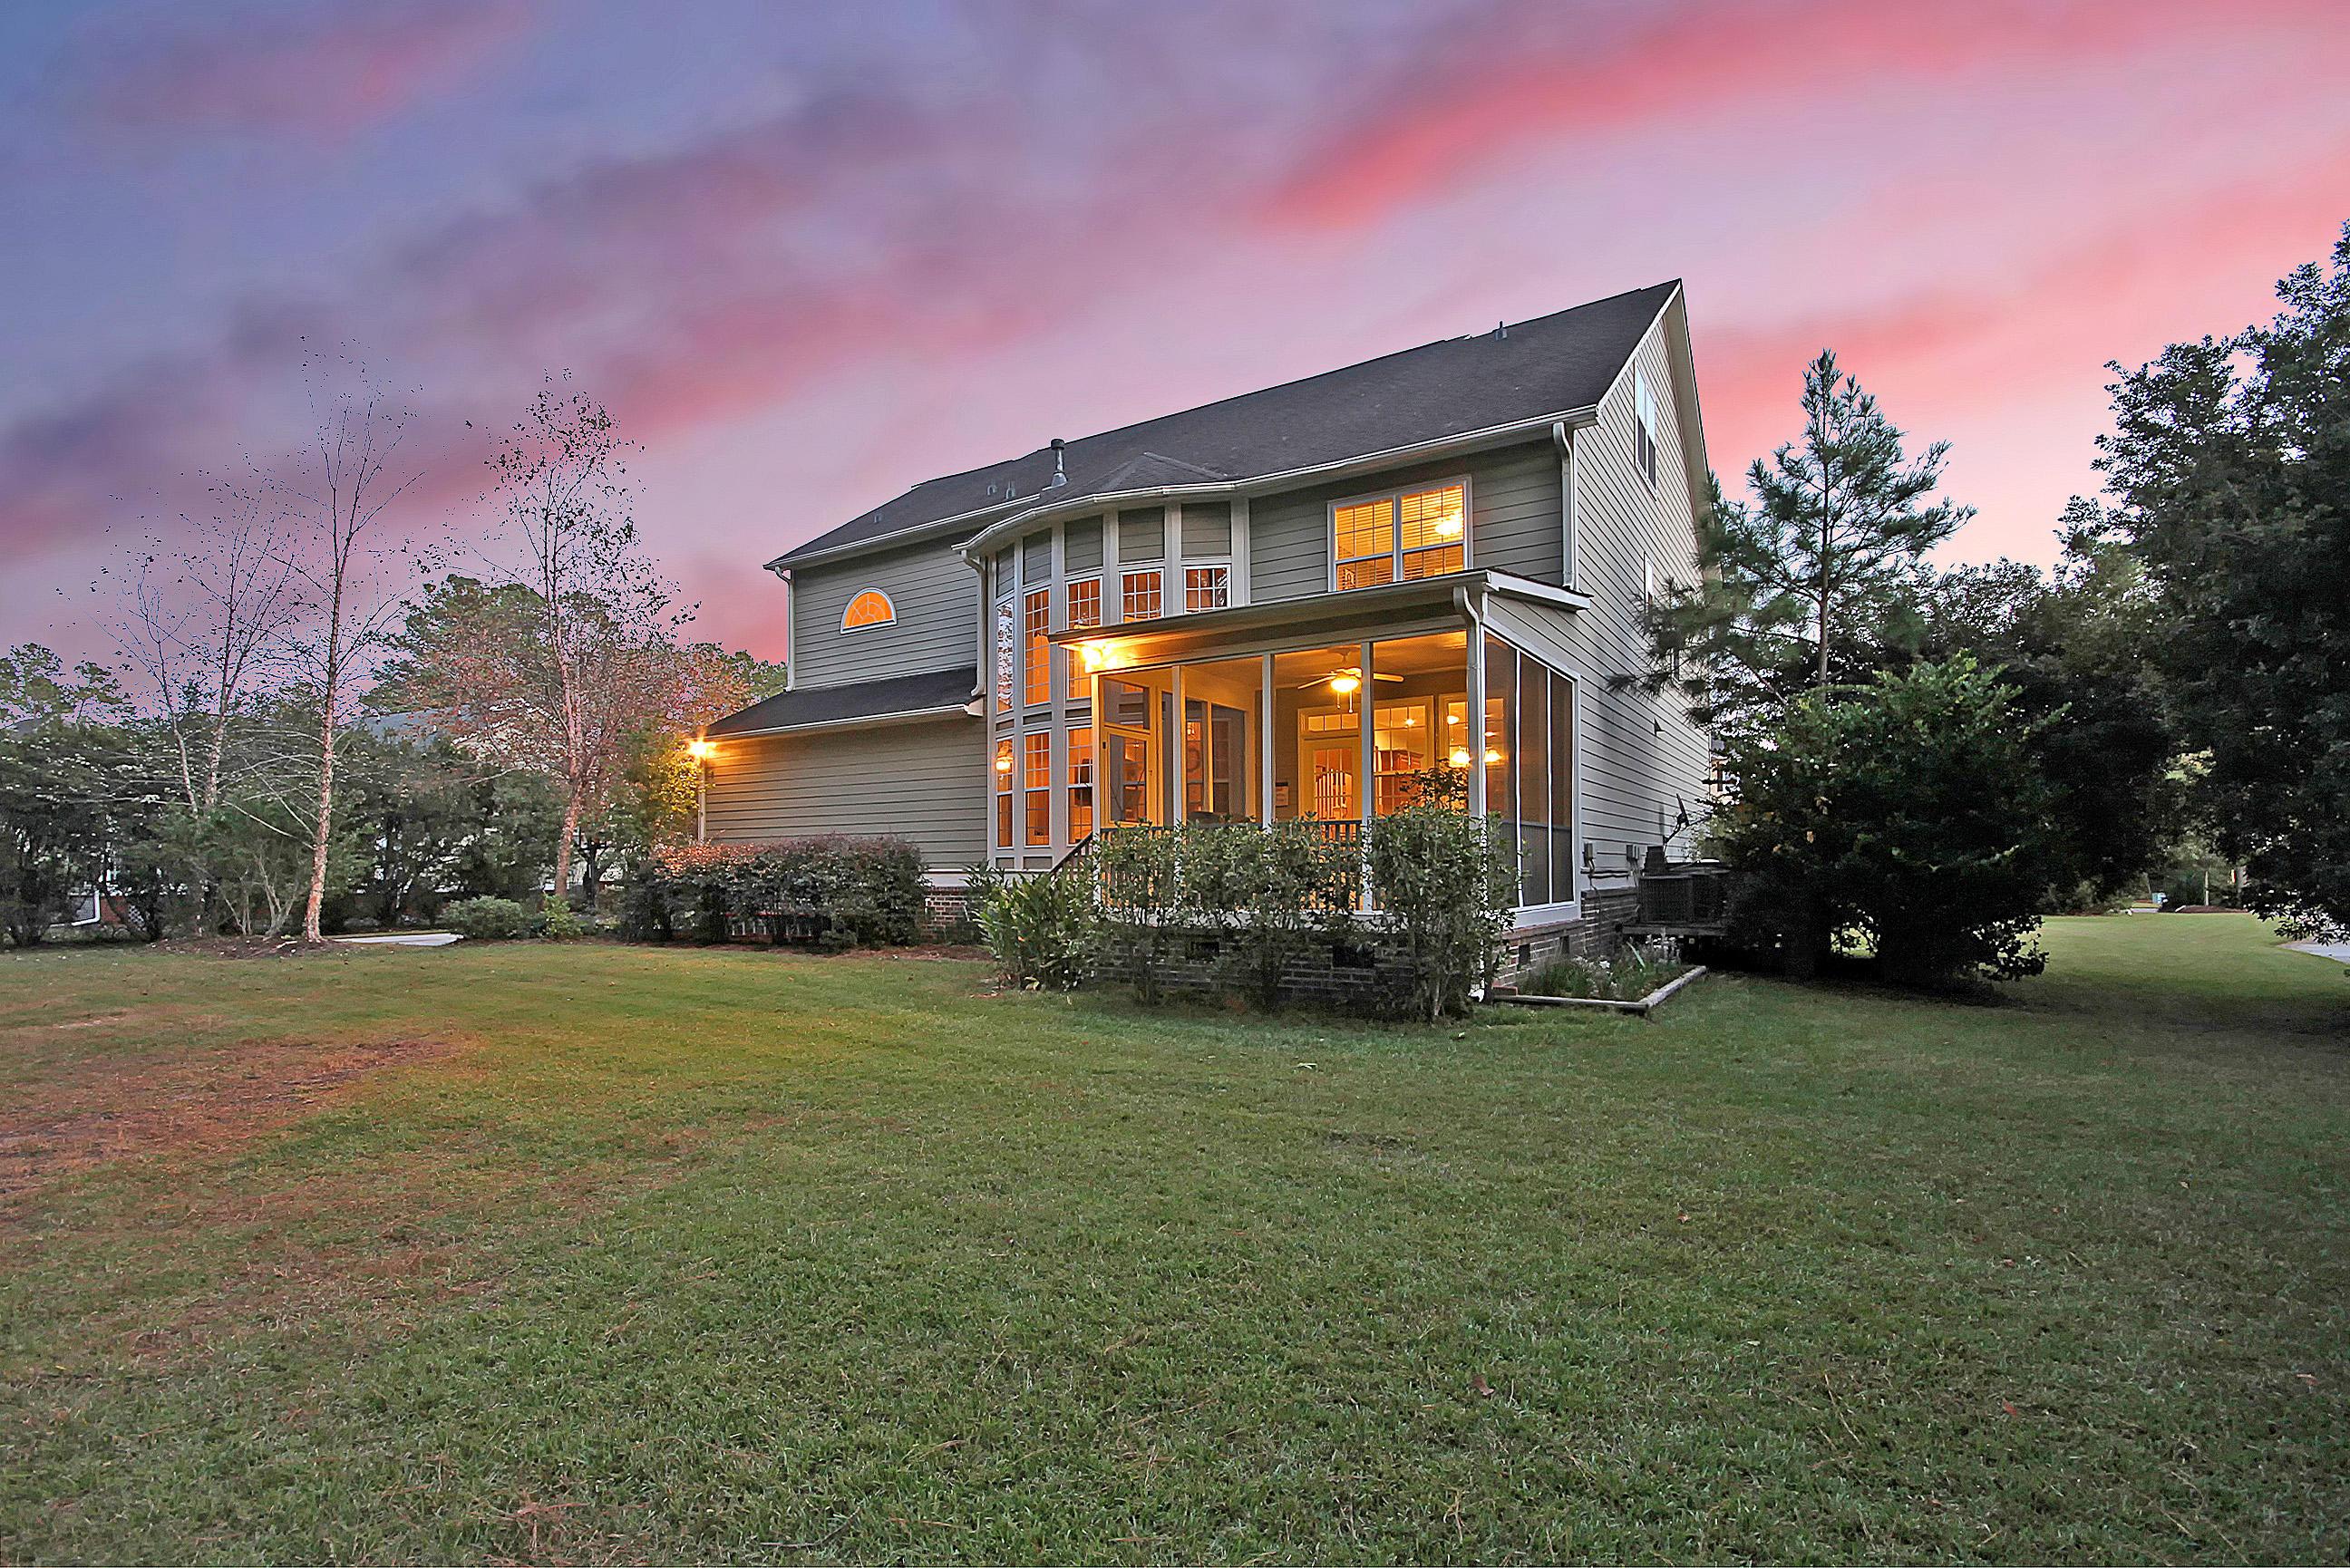 Dunes West Homes For Sale - 2449 Darts Cove, Mount Pleasant, SC - 33